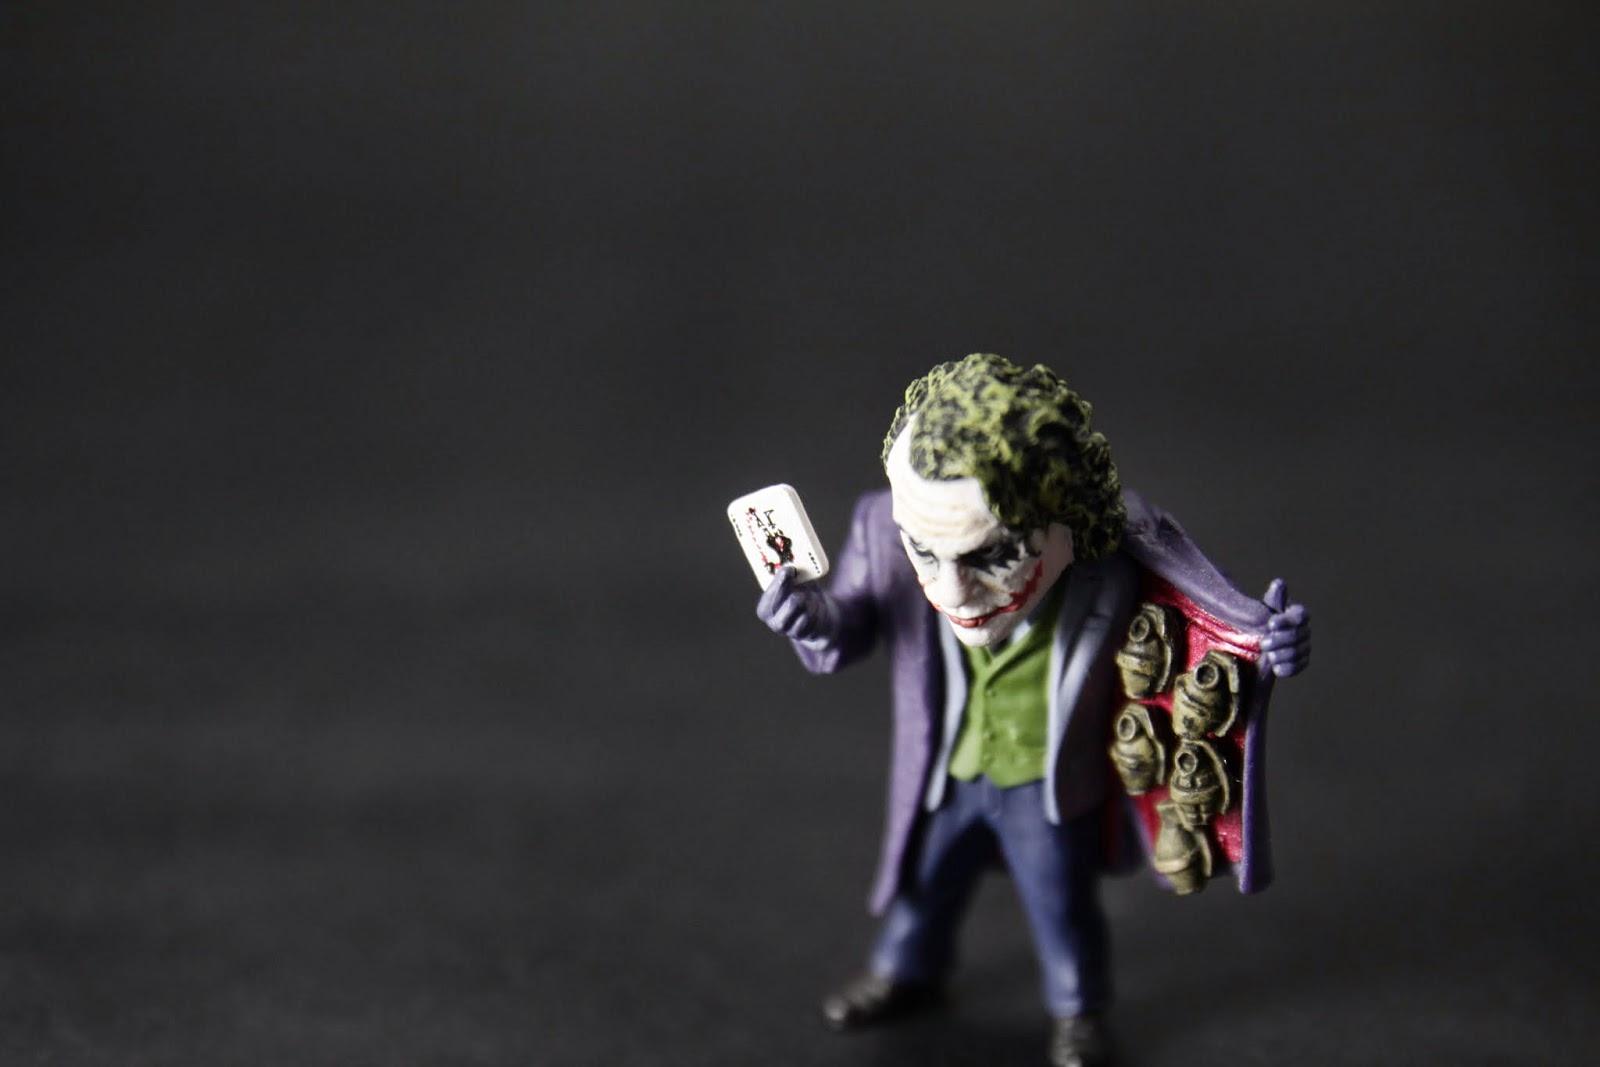 """Here's My Card"" 雖然小但上面的圖沒有偷懶"